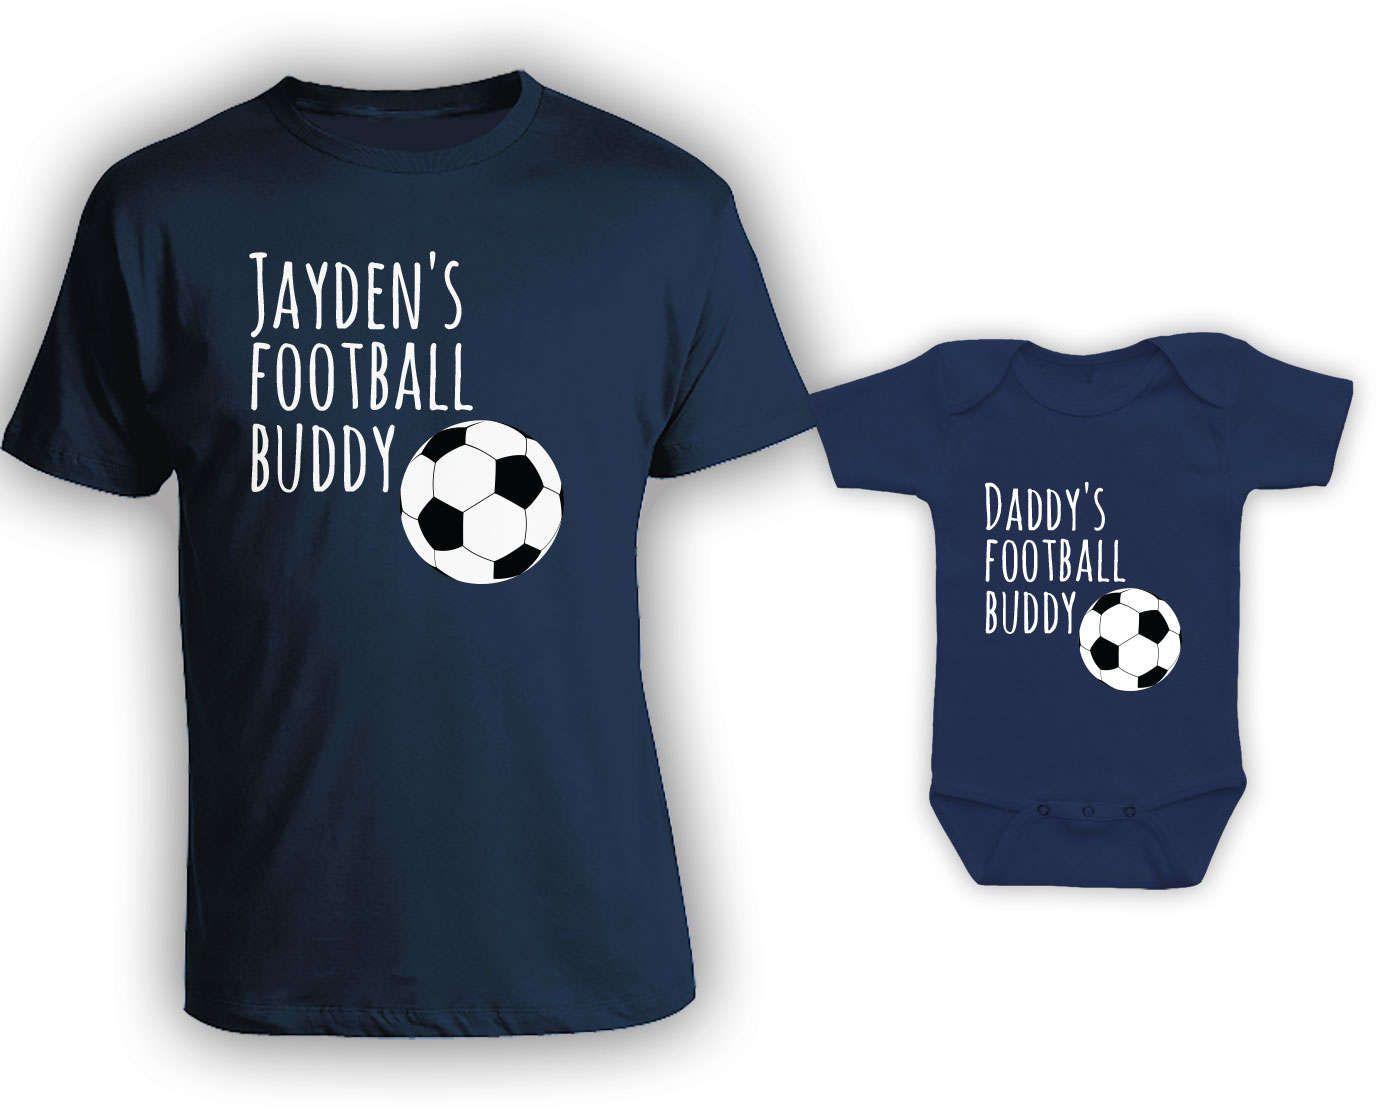 Football buddies matching tshirt set matching father son